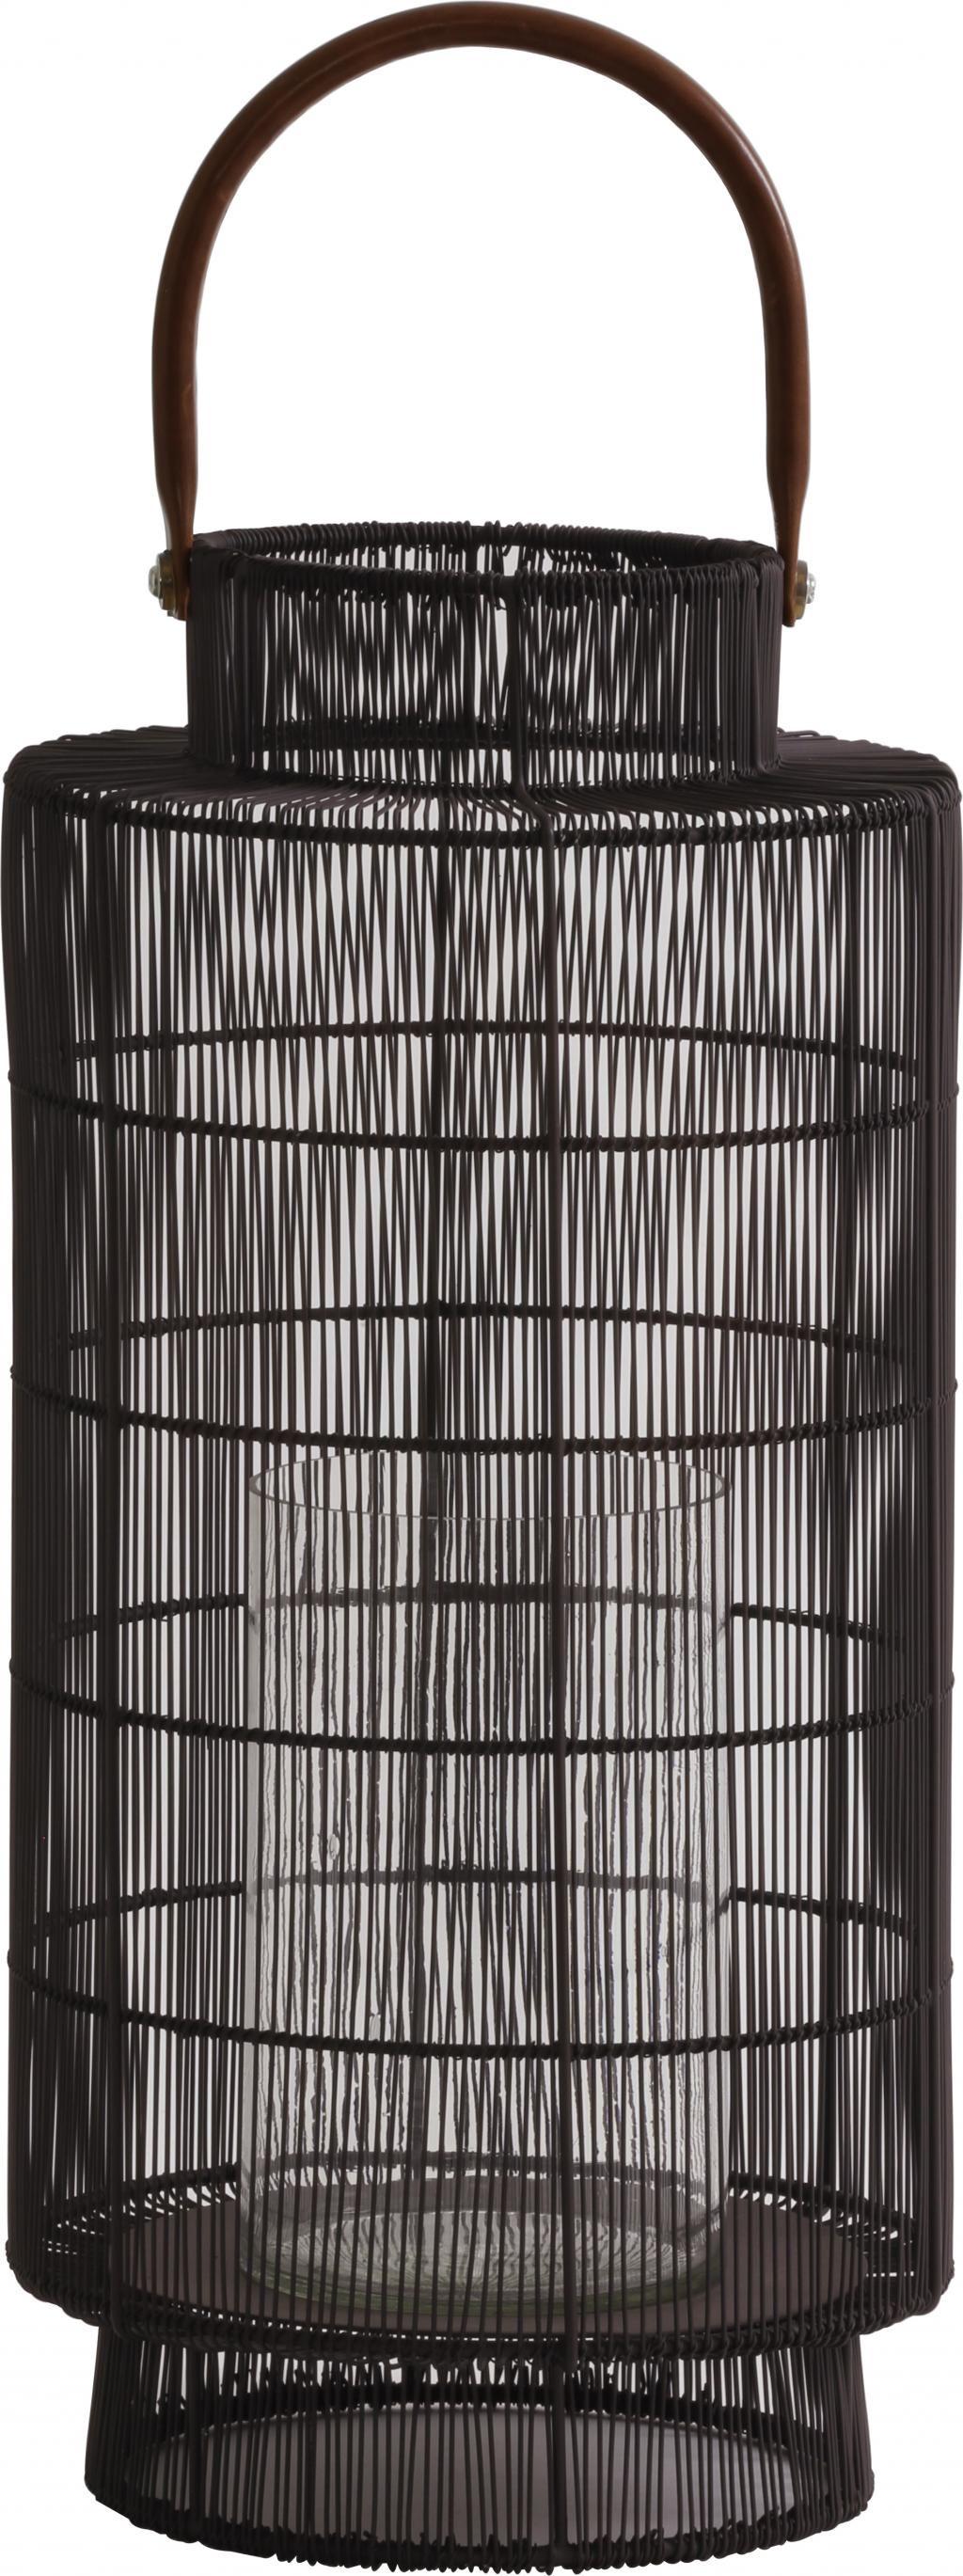 lantaarn-teglio-draad-bruin-met-hendel---light-and-living[0].jpg